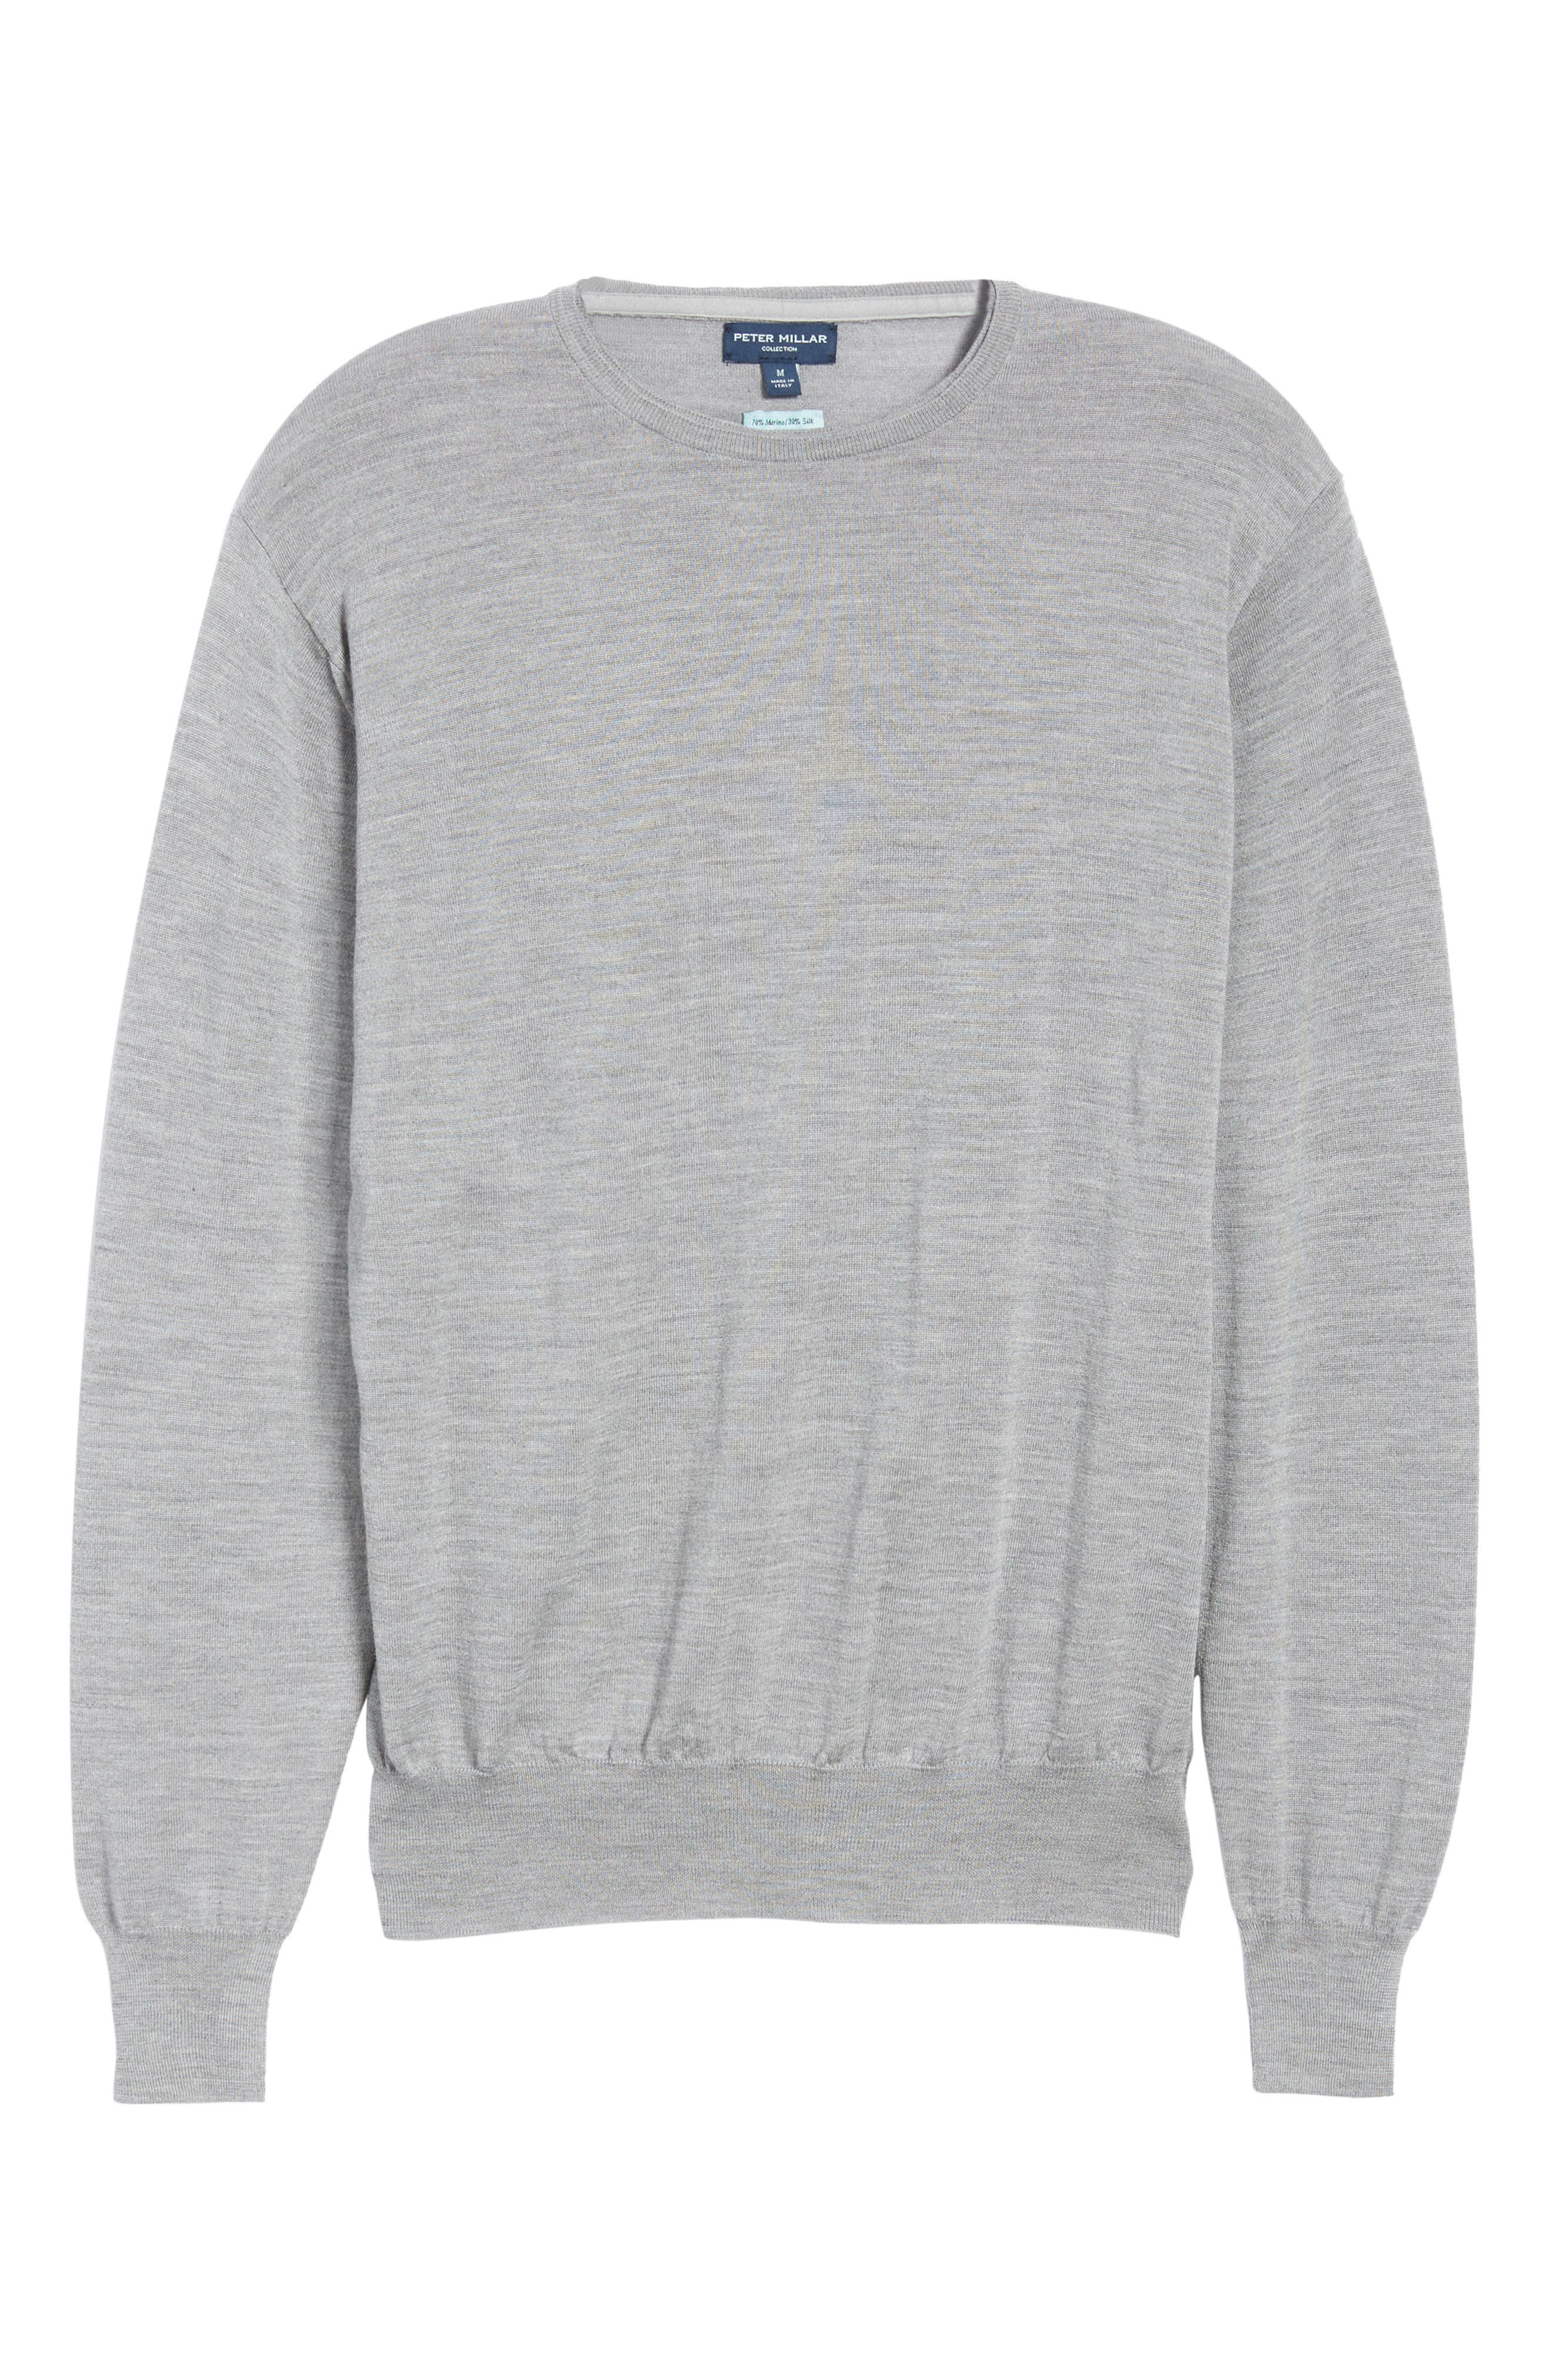 Merino Wool & Silk Crewneck Sweater,                             Alternate thumbnail 6, color,                             036